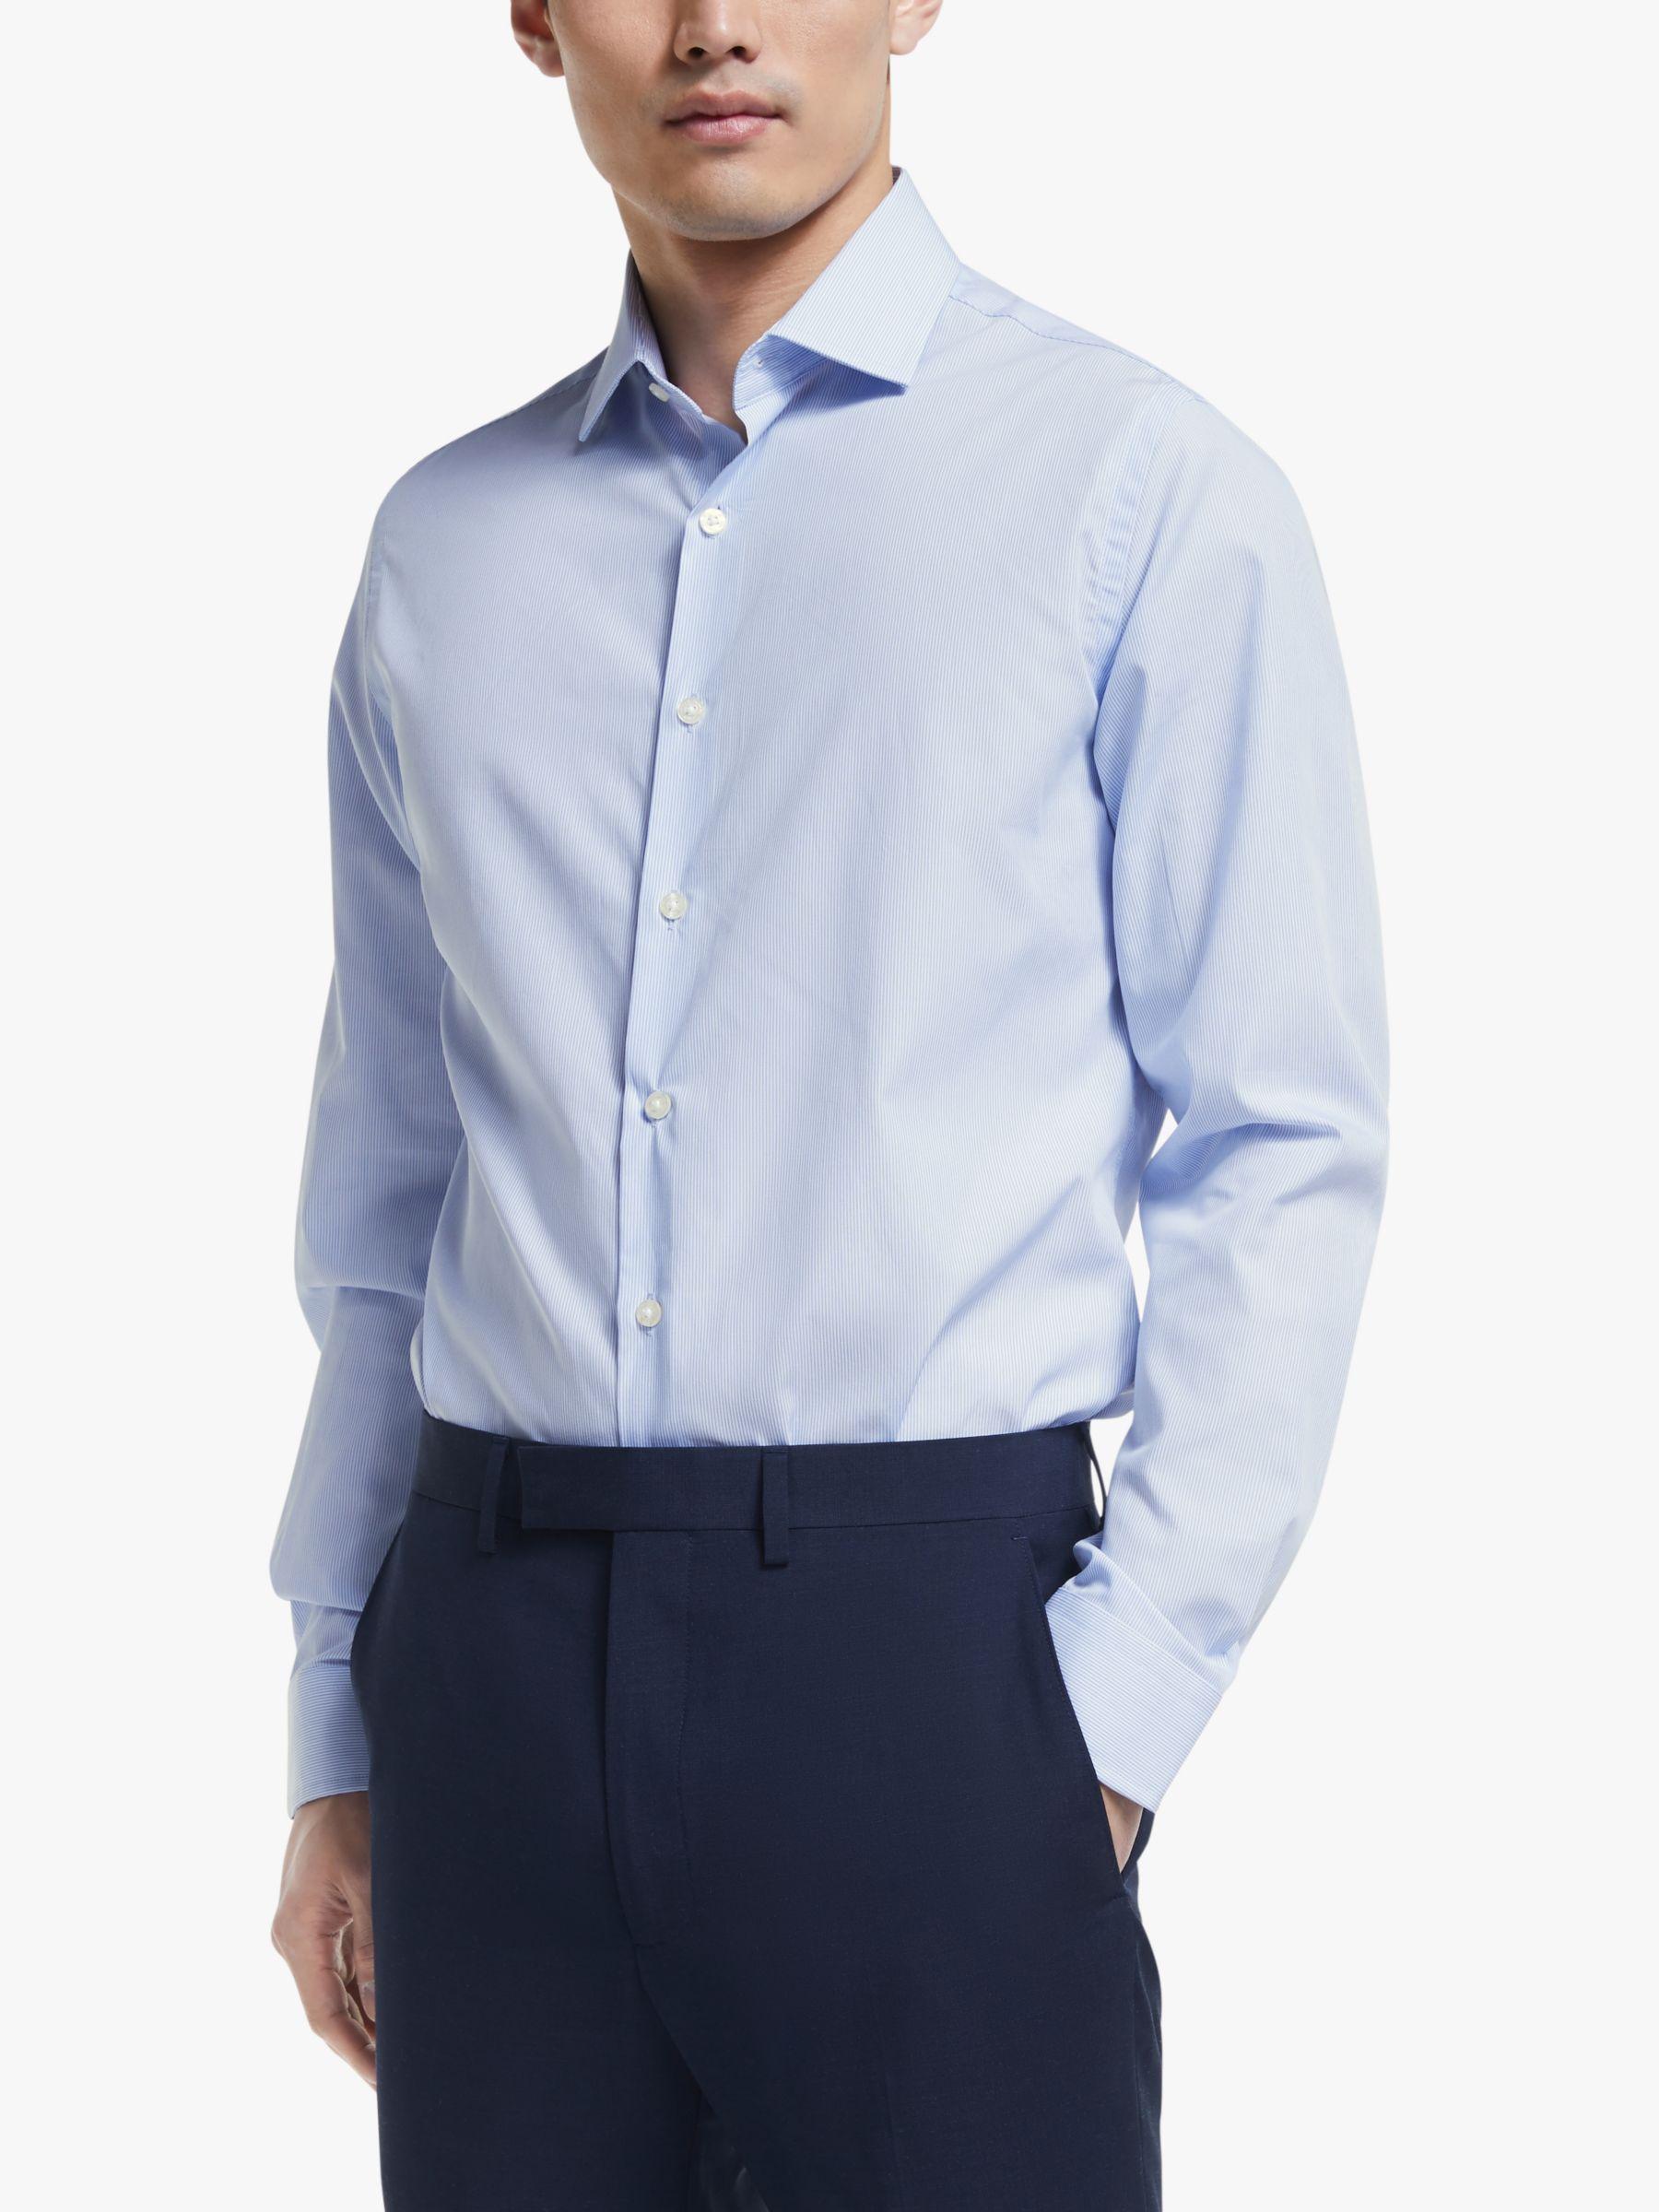 Richard James Mayfair Richard James Mayfair Bengal Stripe Shirt, Blue